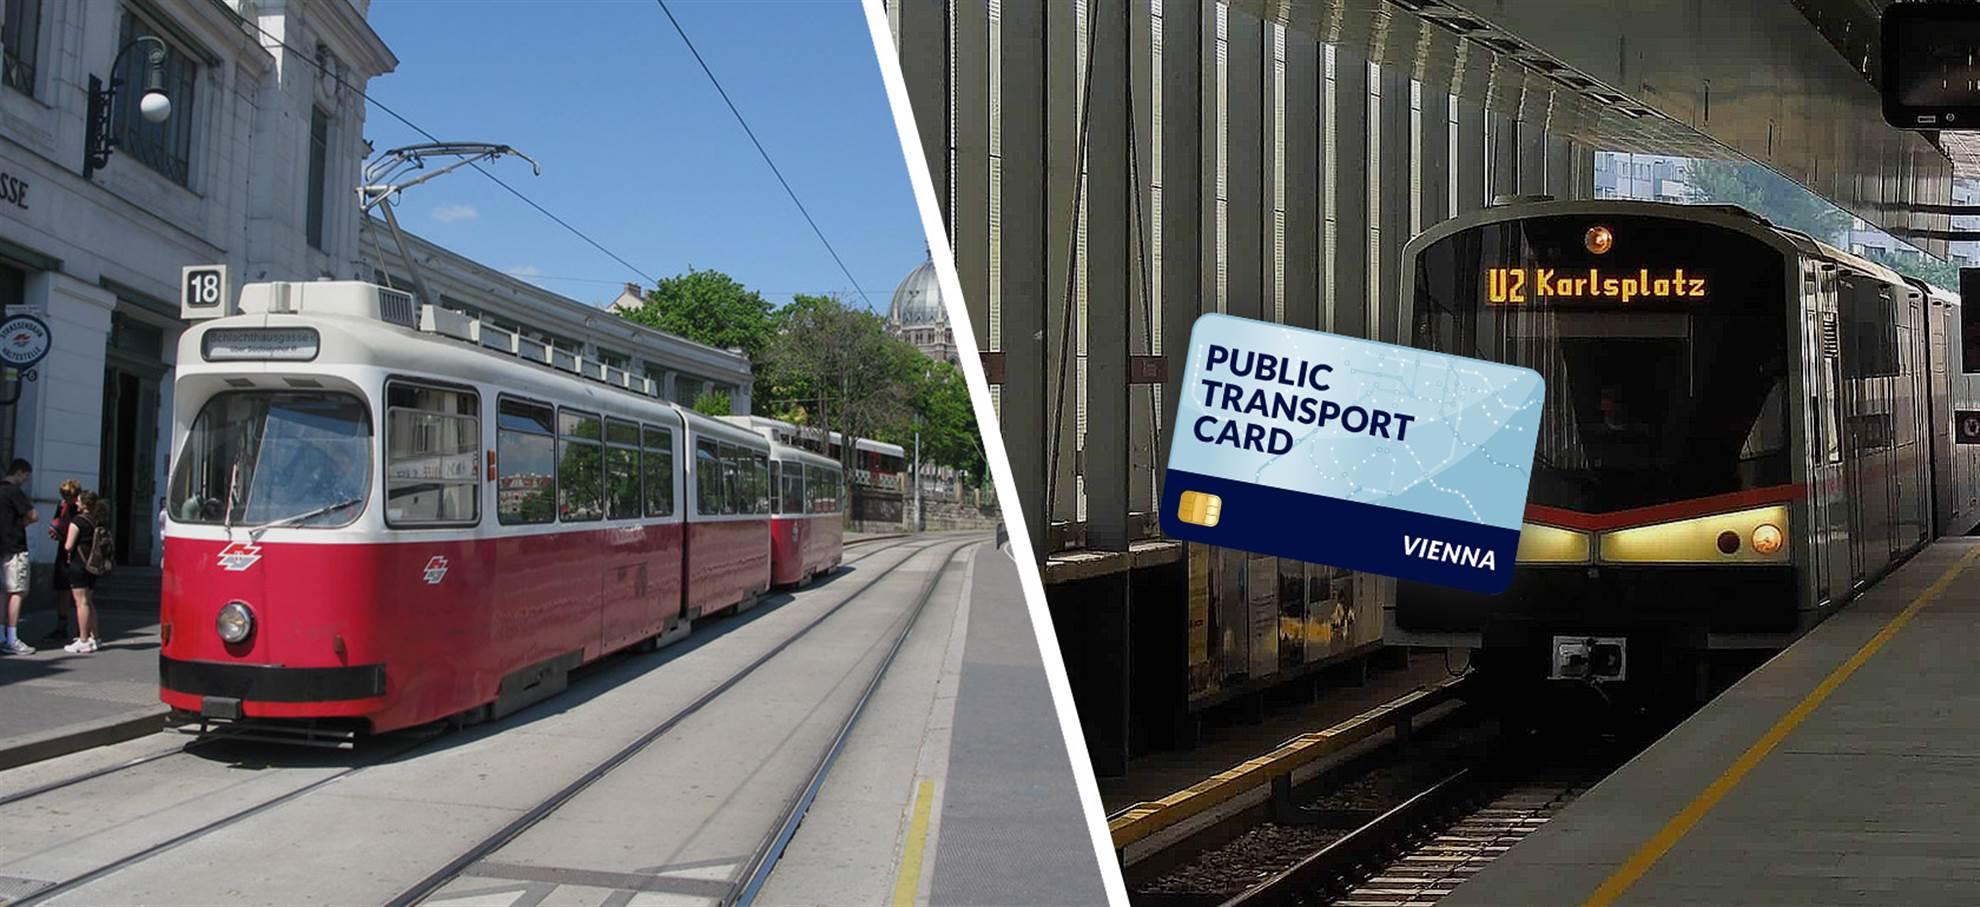 Viena Travel Card